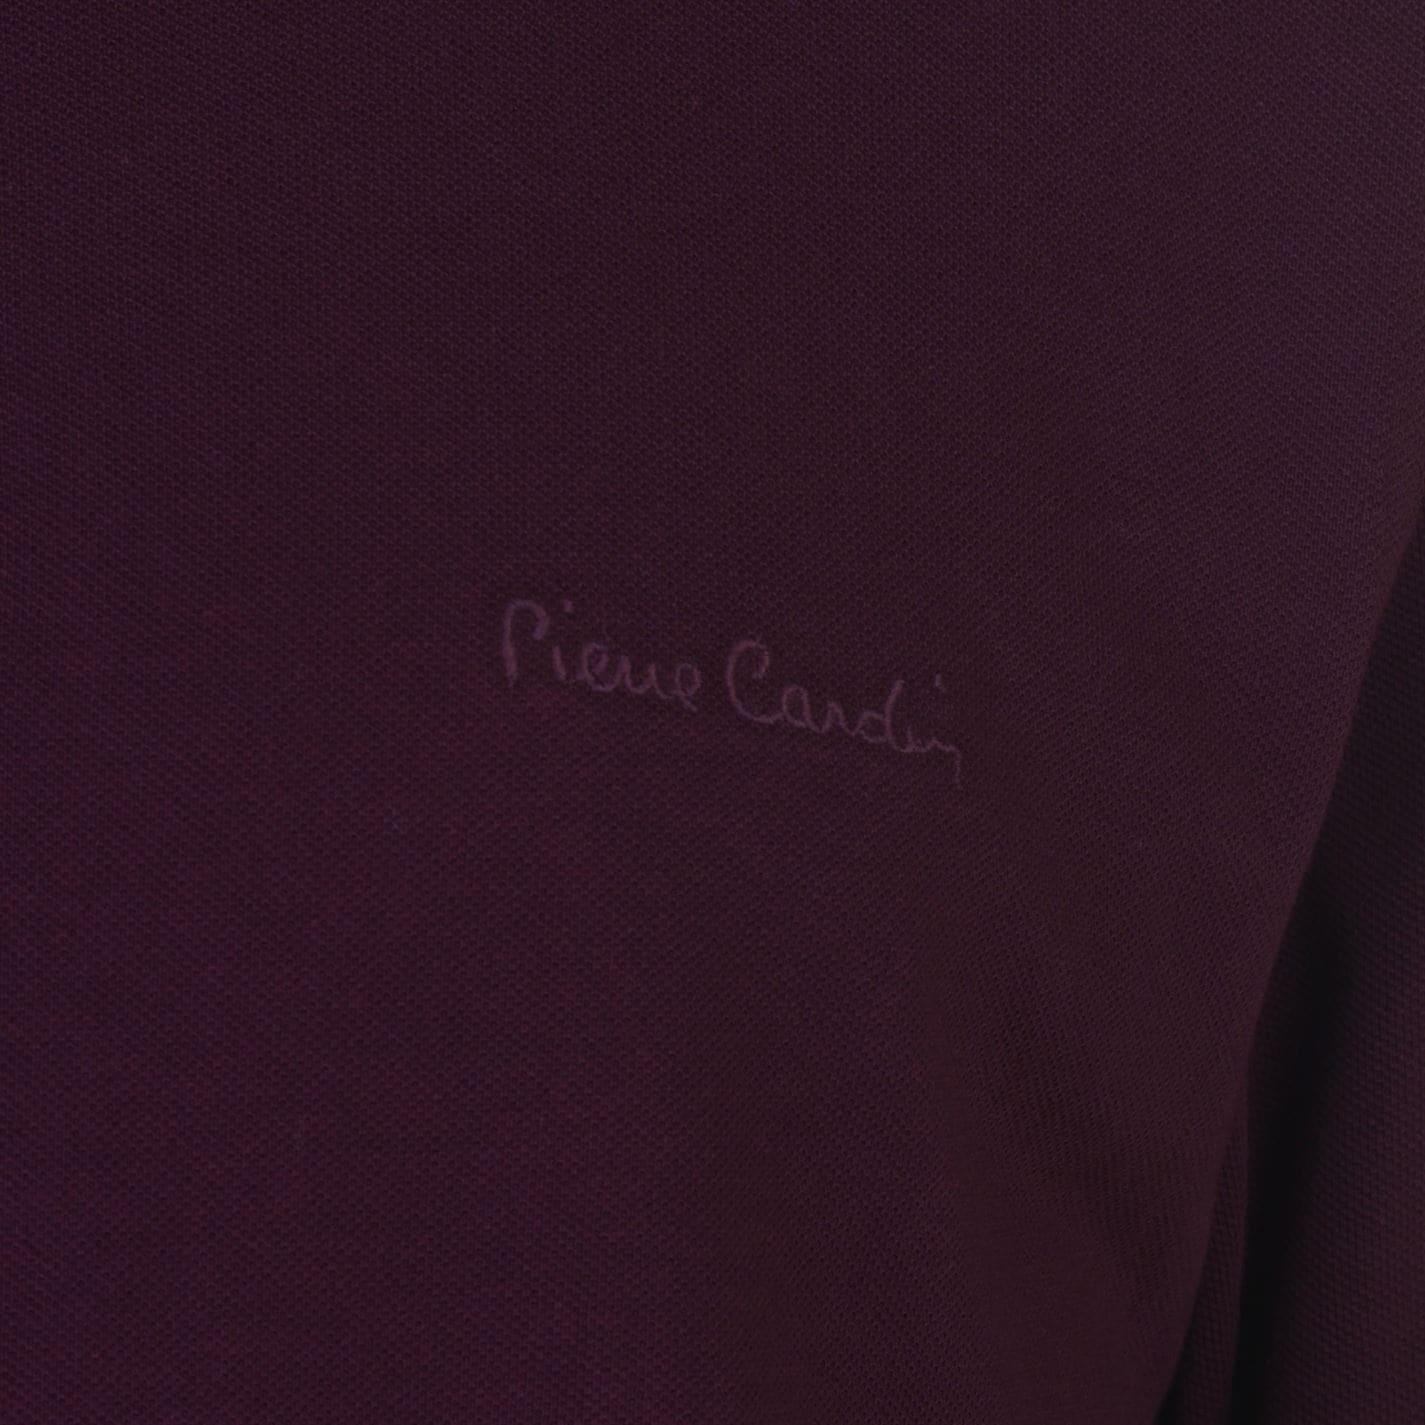 NEW-Pierre-Cardin-Mens-Long-Sleeve-Pure-Cotton-Polo-Shirt-Size-S-M-L-XL-XXL thumbnail 27